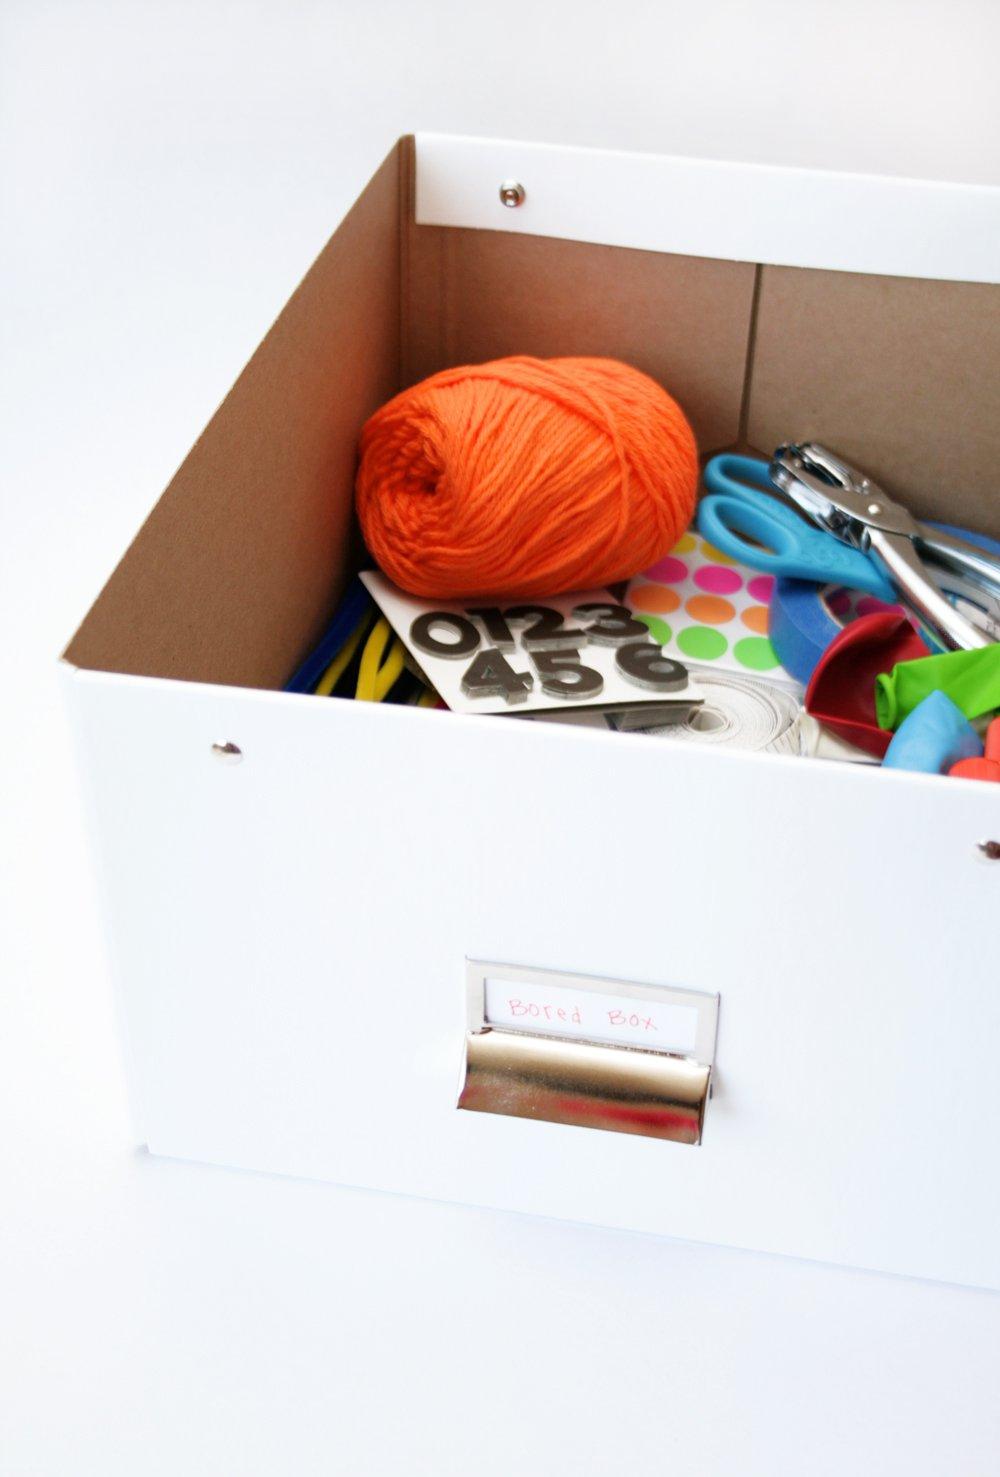 Make a Bored Box to Help Combat Summer Bordeom via @PagingSupermom